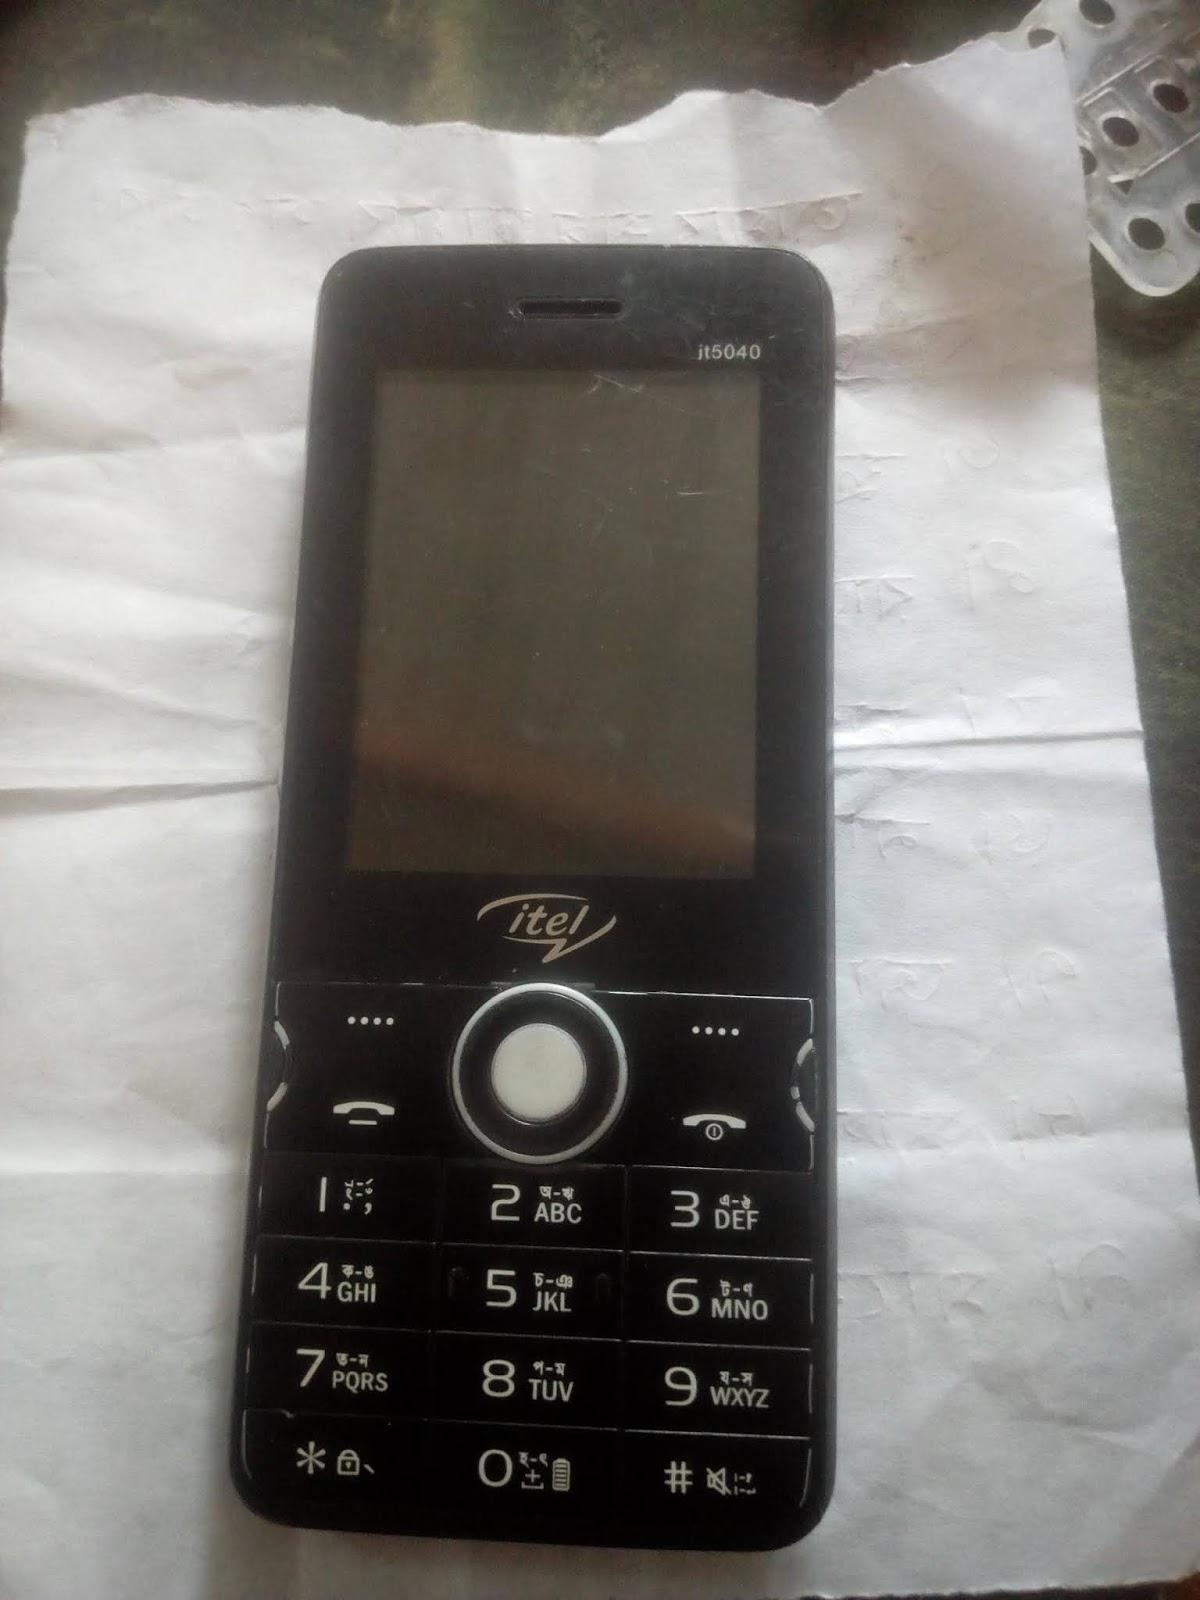 Itel_IT5040_MT6261 Flash File 100% TESTED GSM SHAKIL - SHAKIL TELECOM